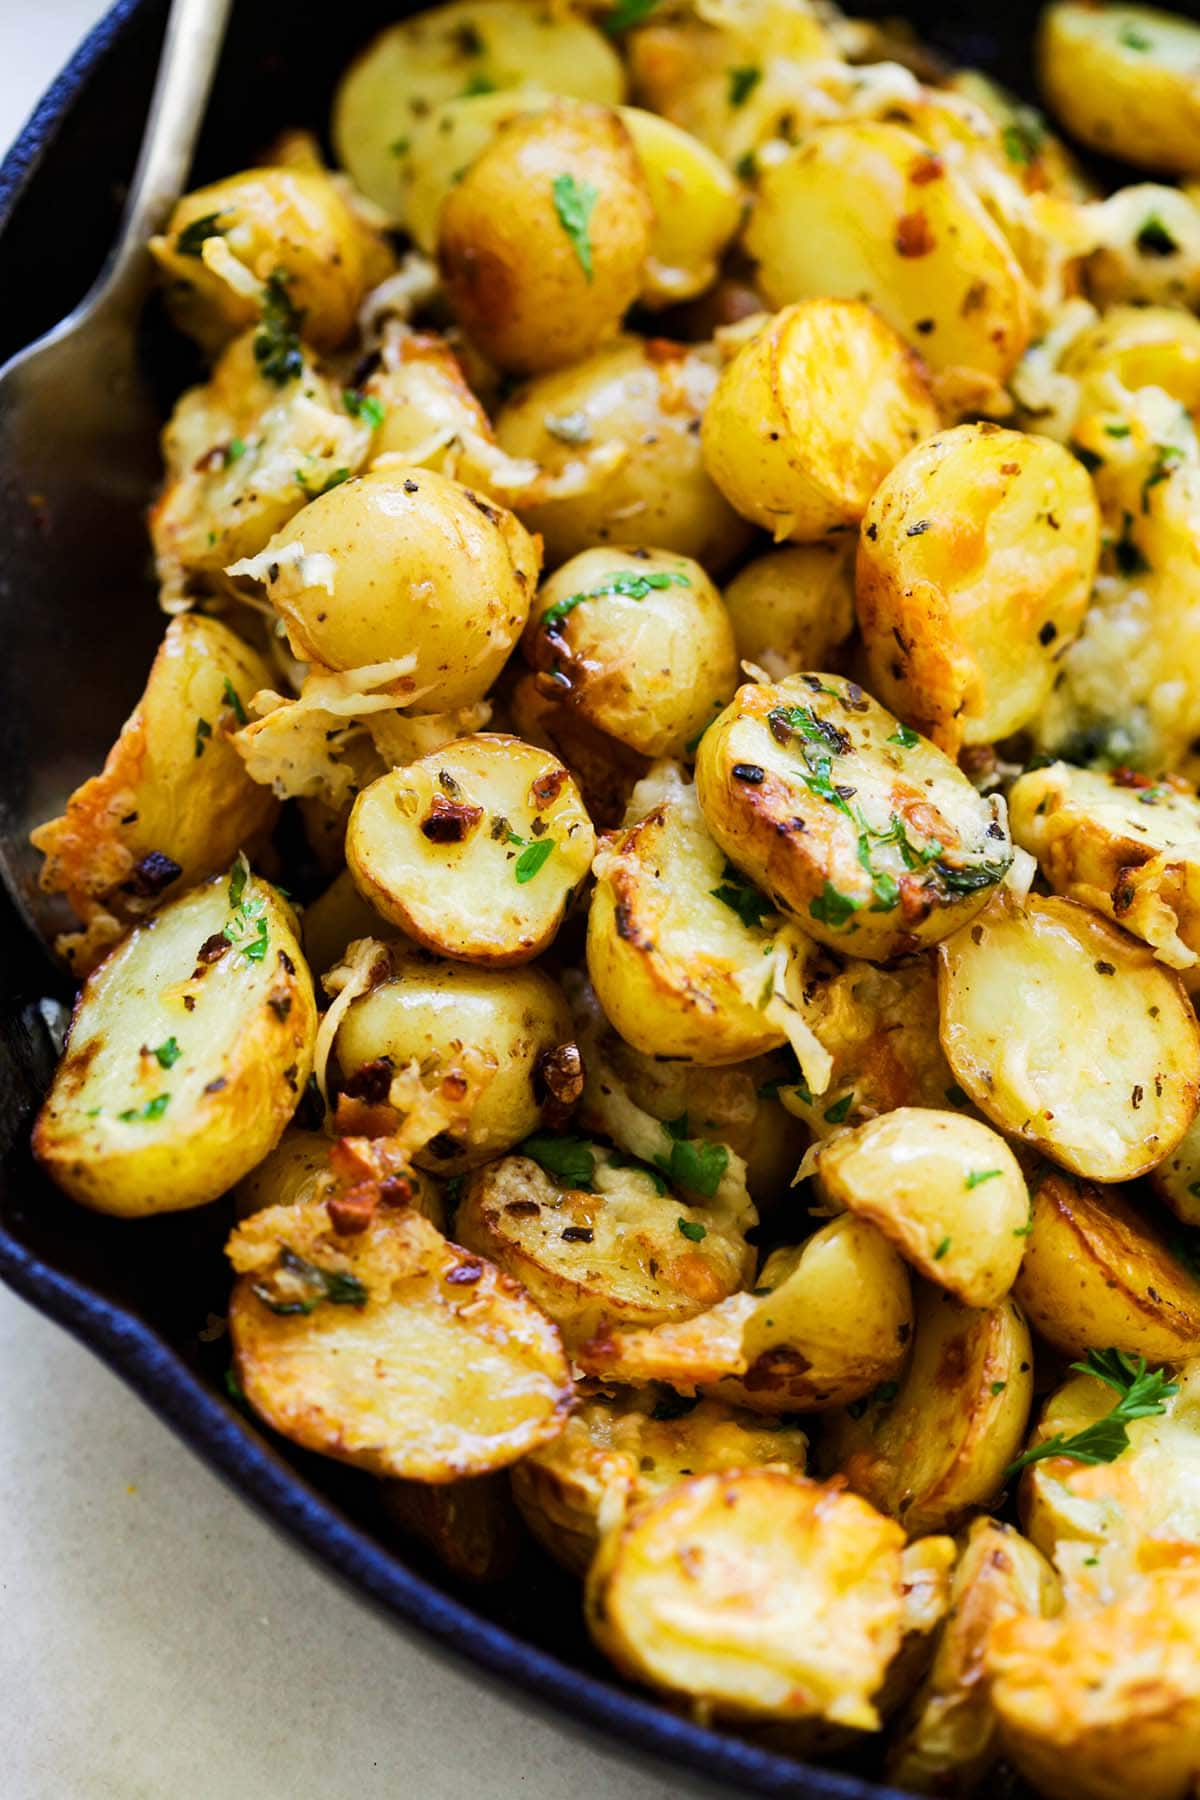 Easy tasty Italian roasted potatoes in a skillet.